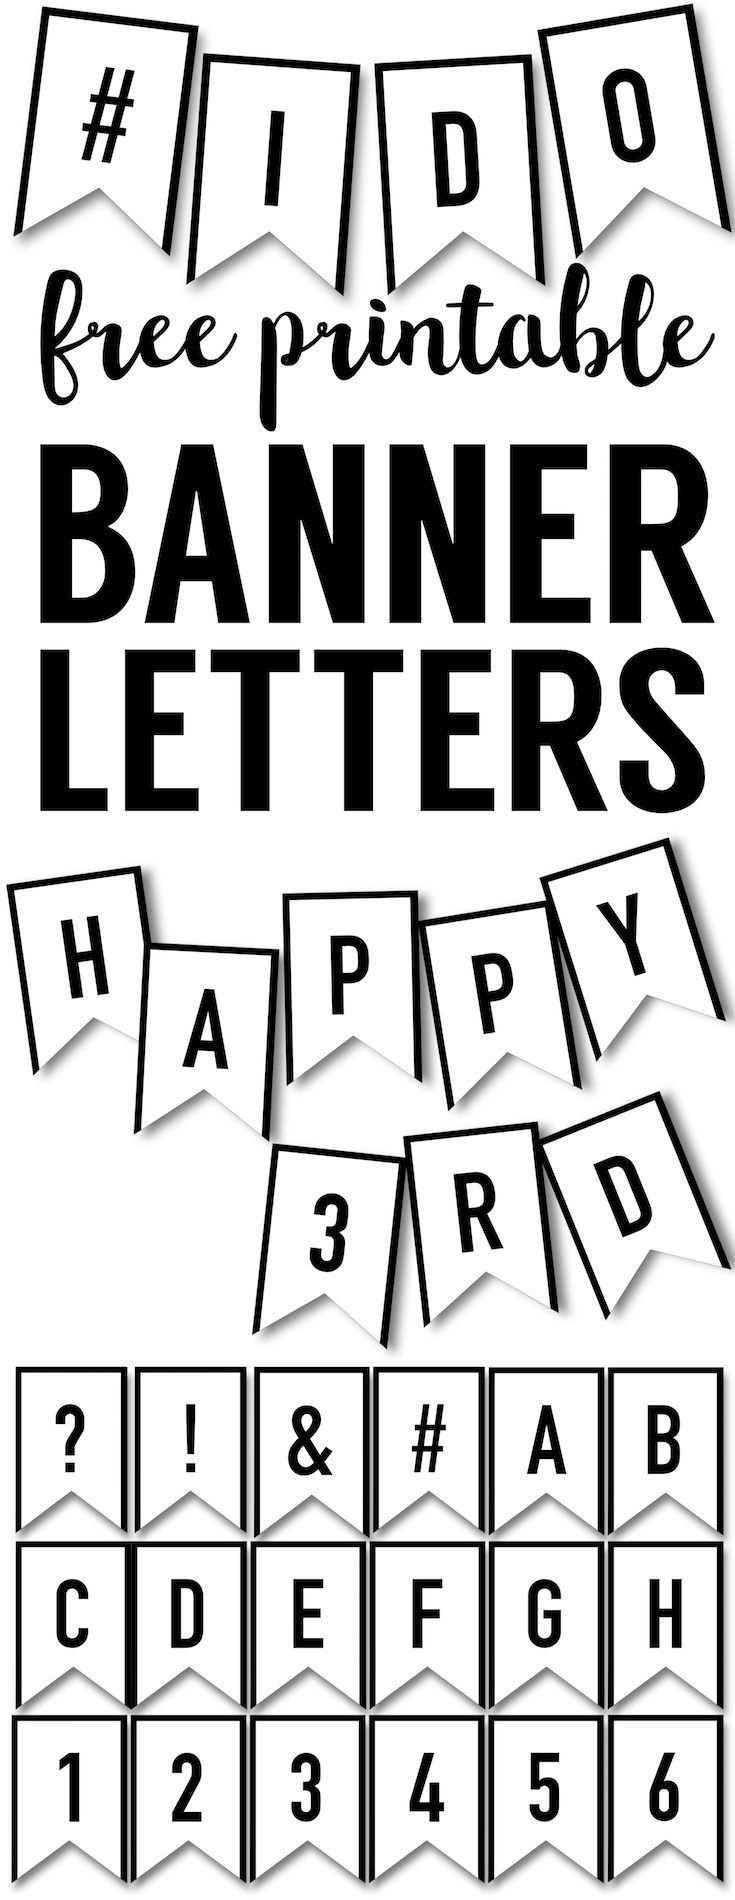 Birthday Banners Template Birthday Banners Template Geburtstag Banner V In 2020 Free Printable Abc Letters Free Printable Banner Letters Printable Birthday Banner